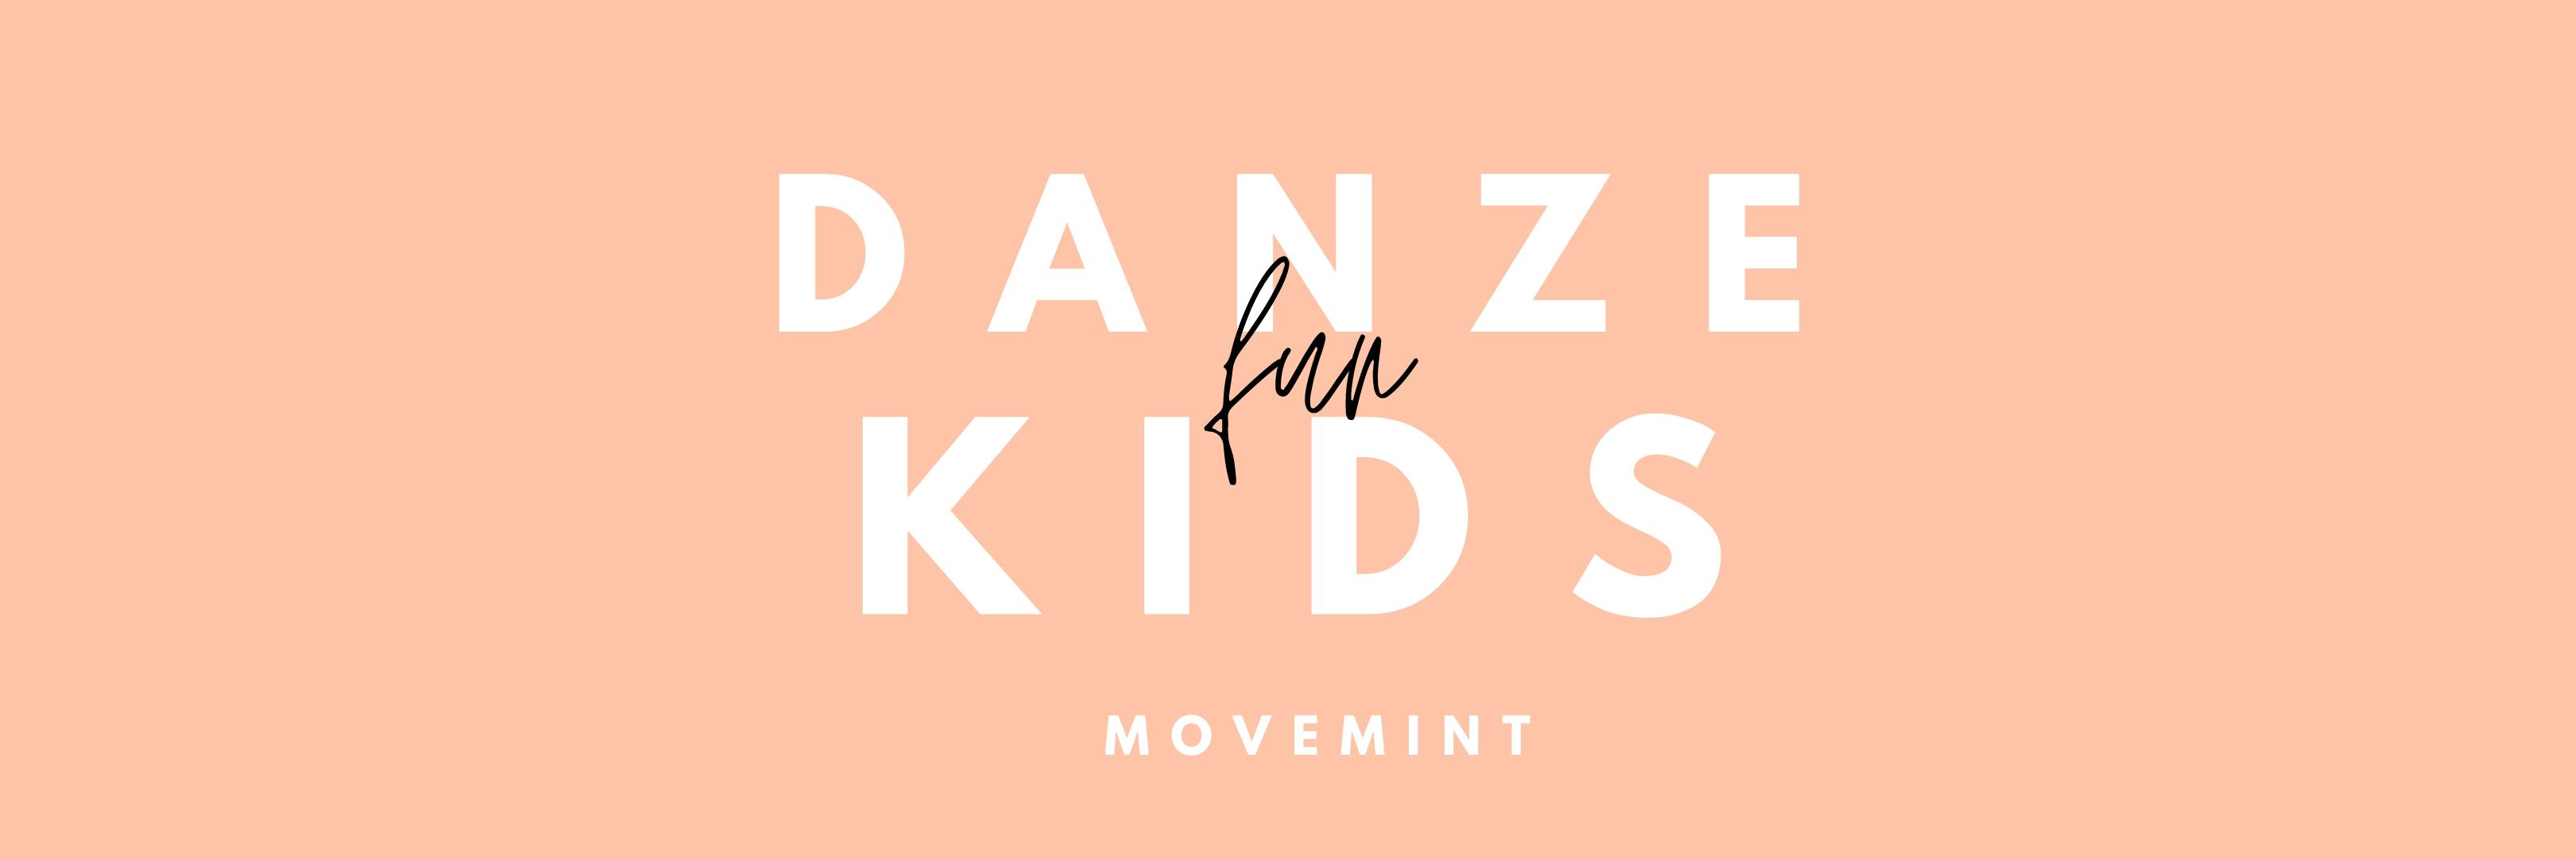 DANZE KIDS